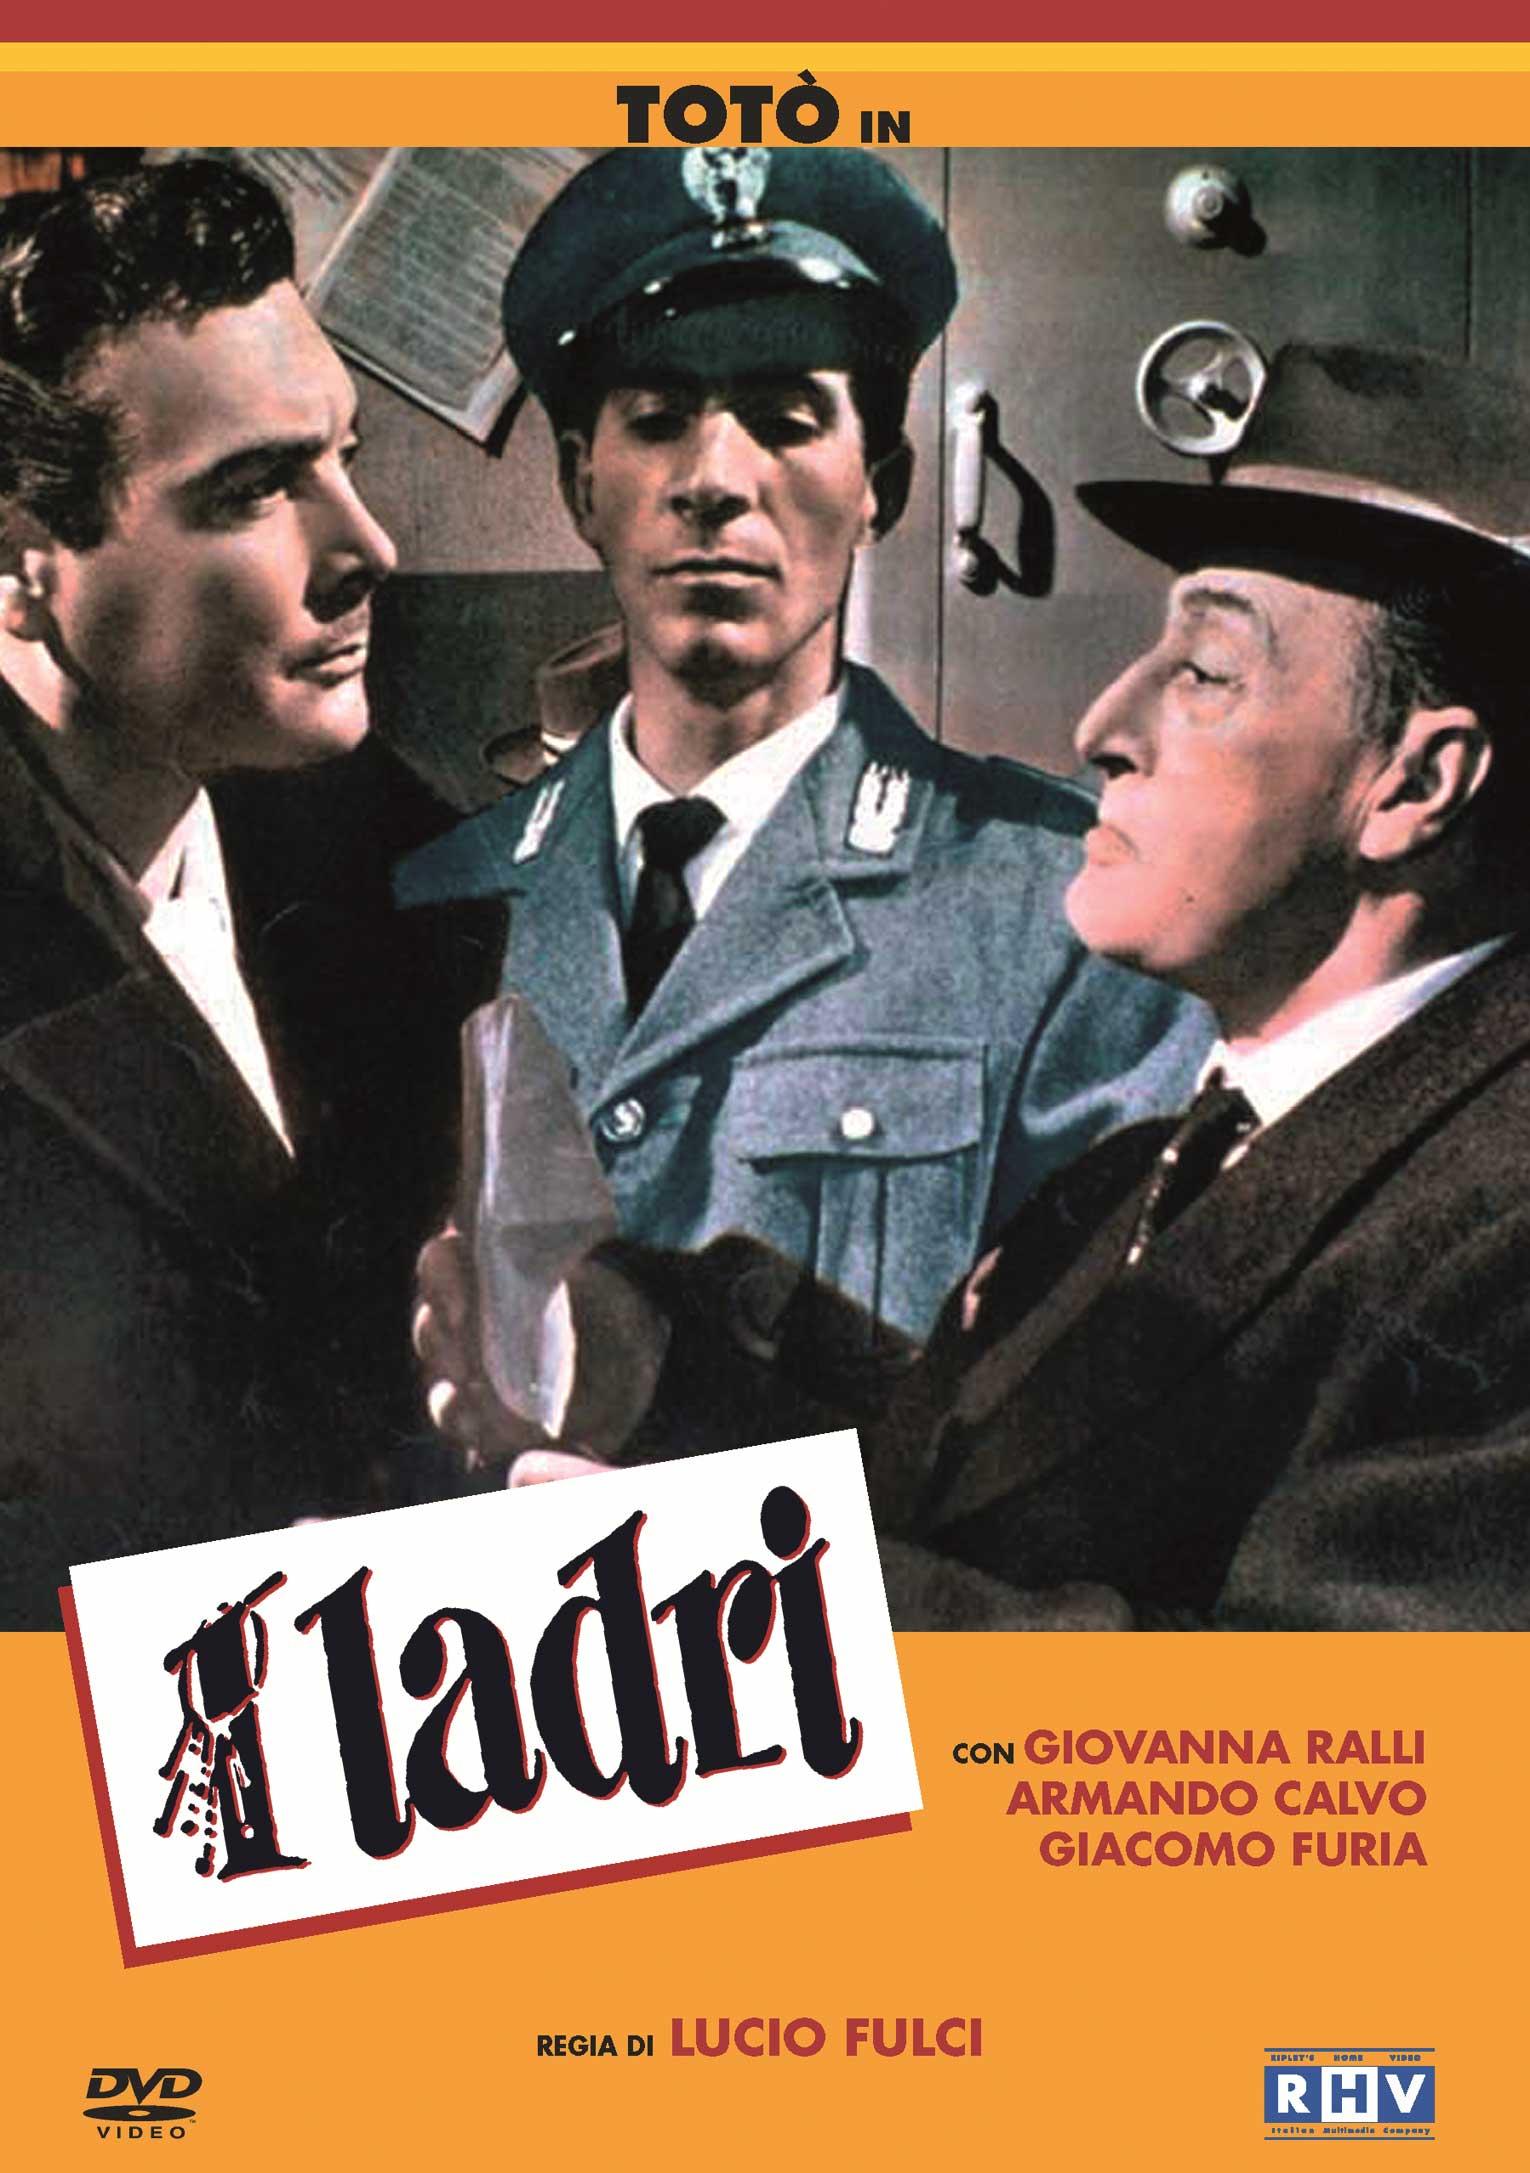 TOTO' - I LADRI (DVD)